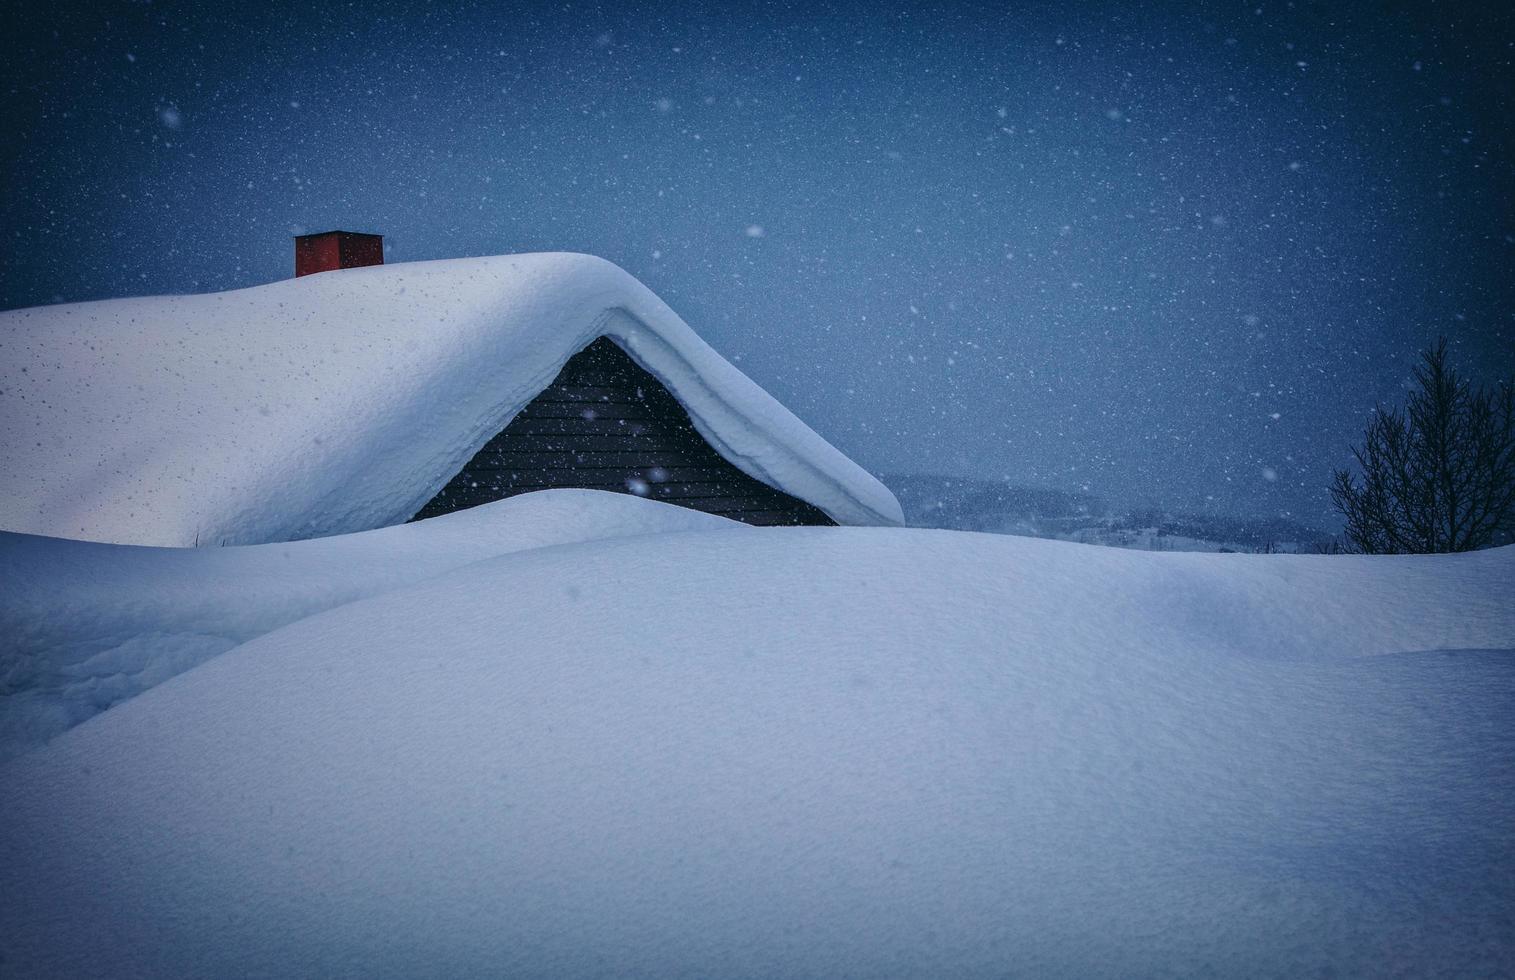 Snow coated house photo